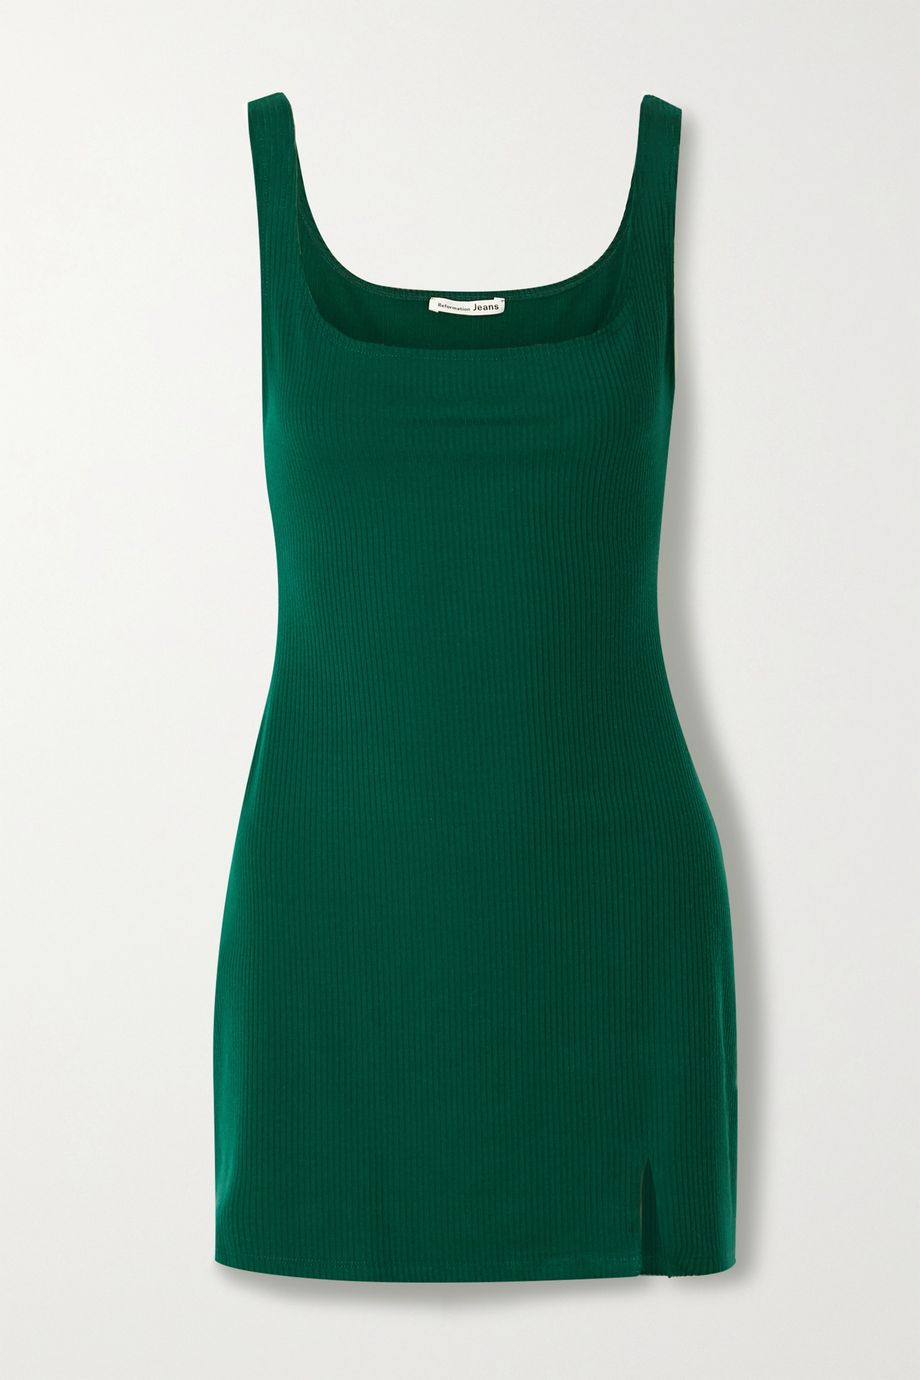 Reformation Karlie ribbed stretch-Tencel mini dress